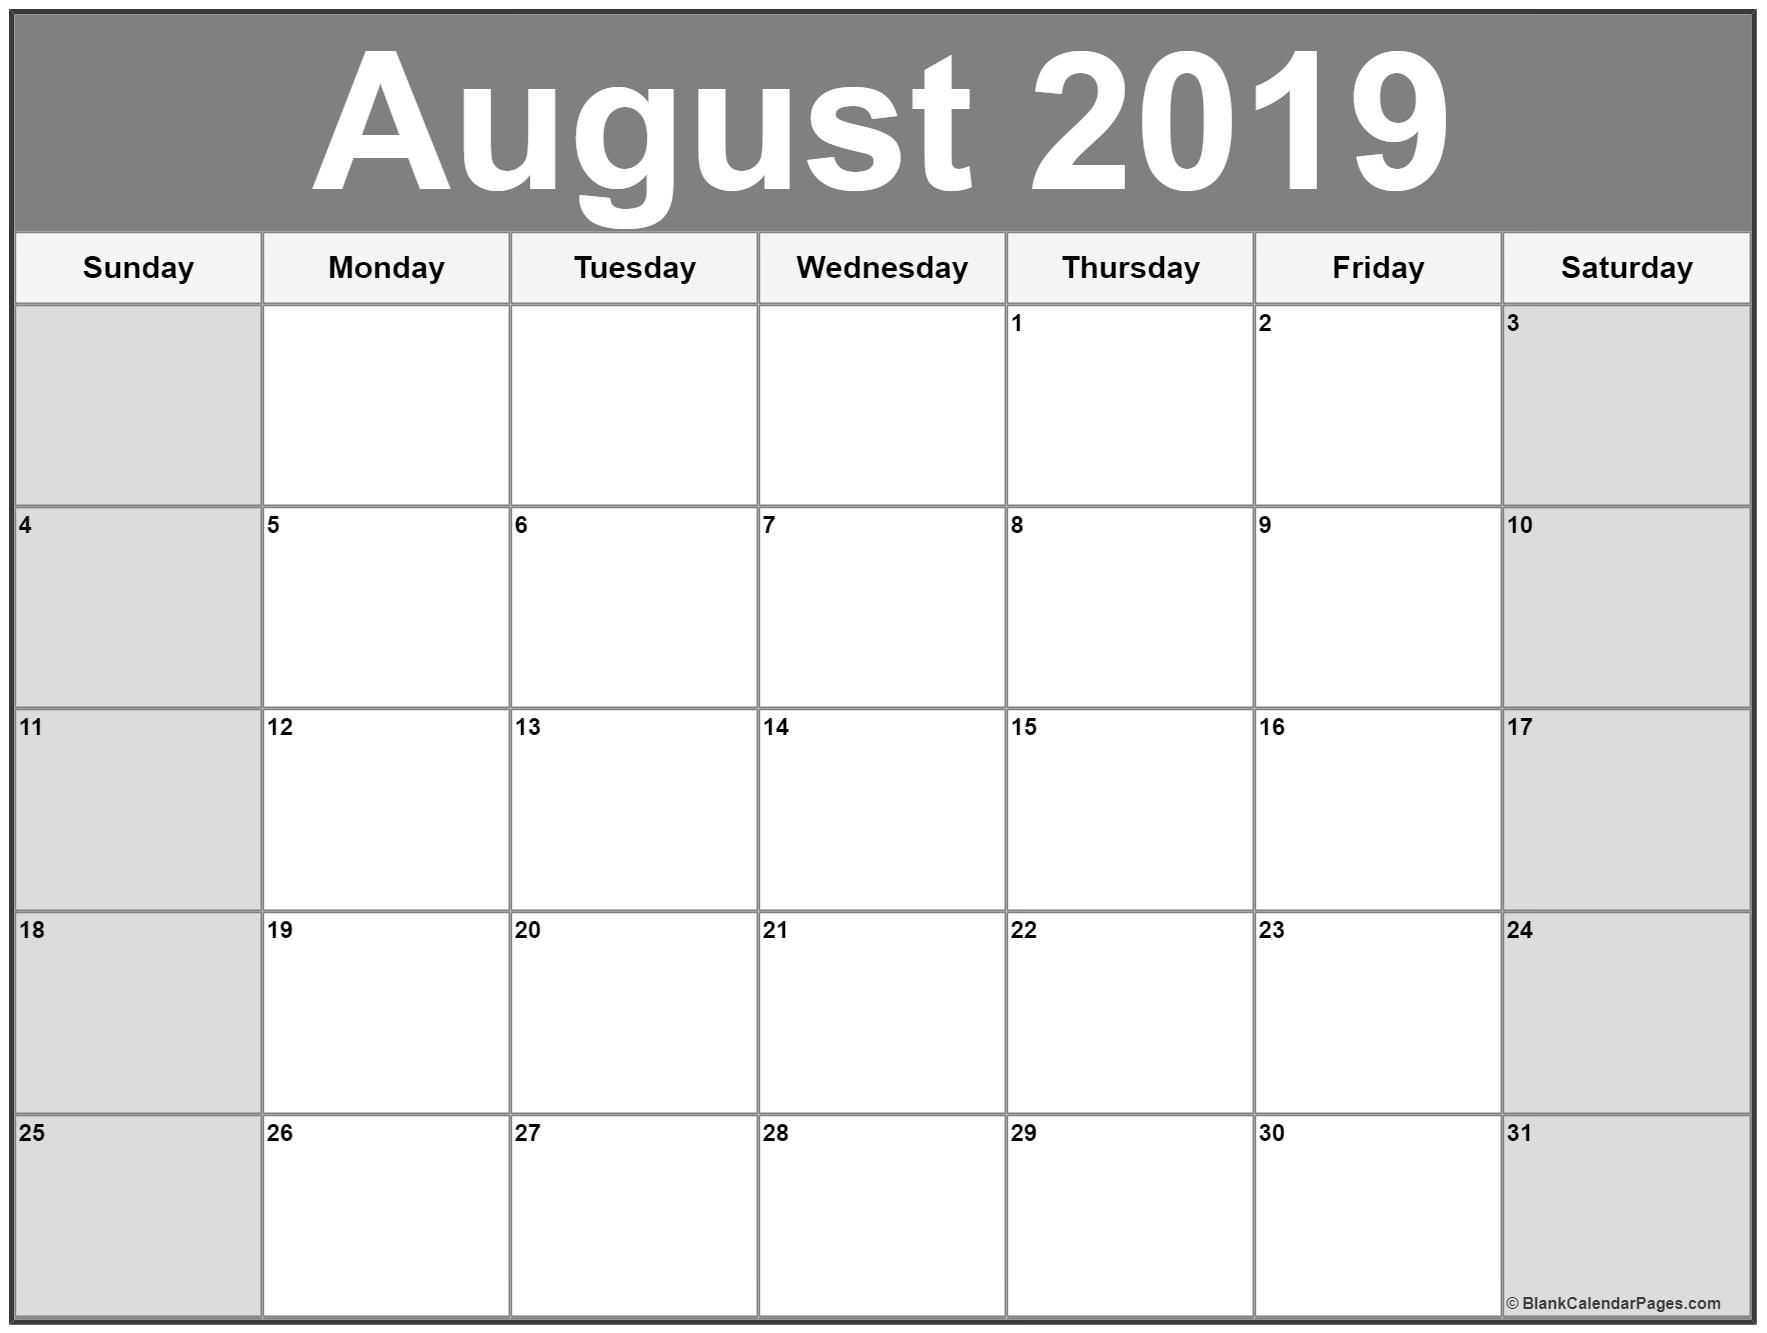 August 2019 Calendar Printable Free | Calendar Printables regarding Printable Blank Calendar July And August